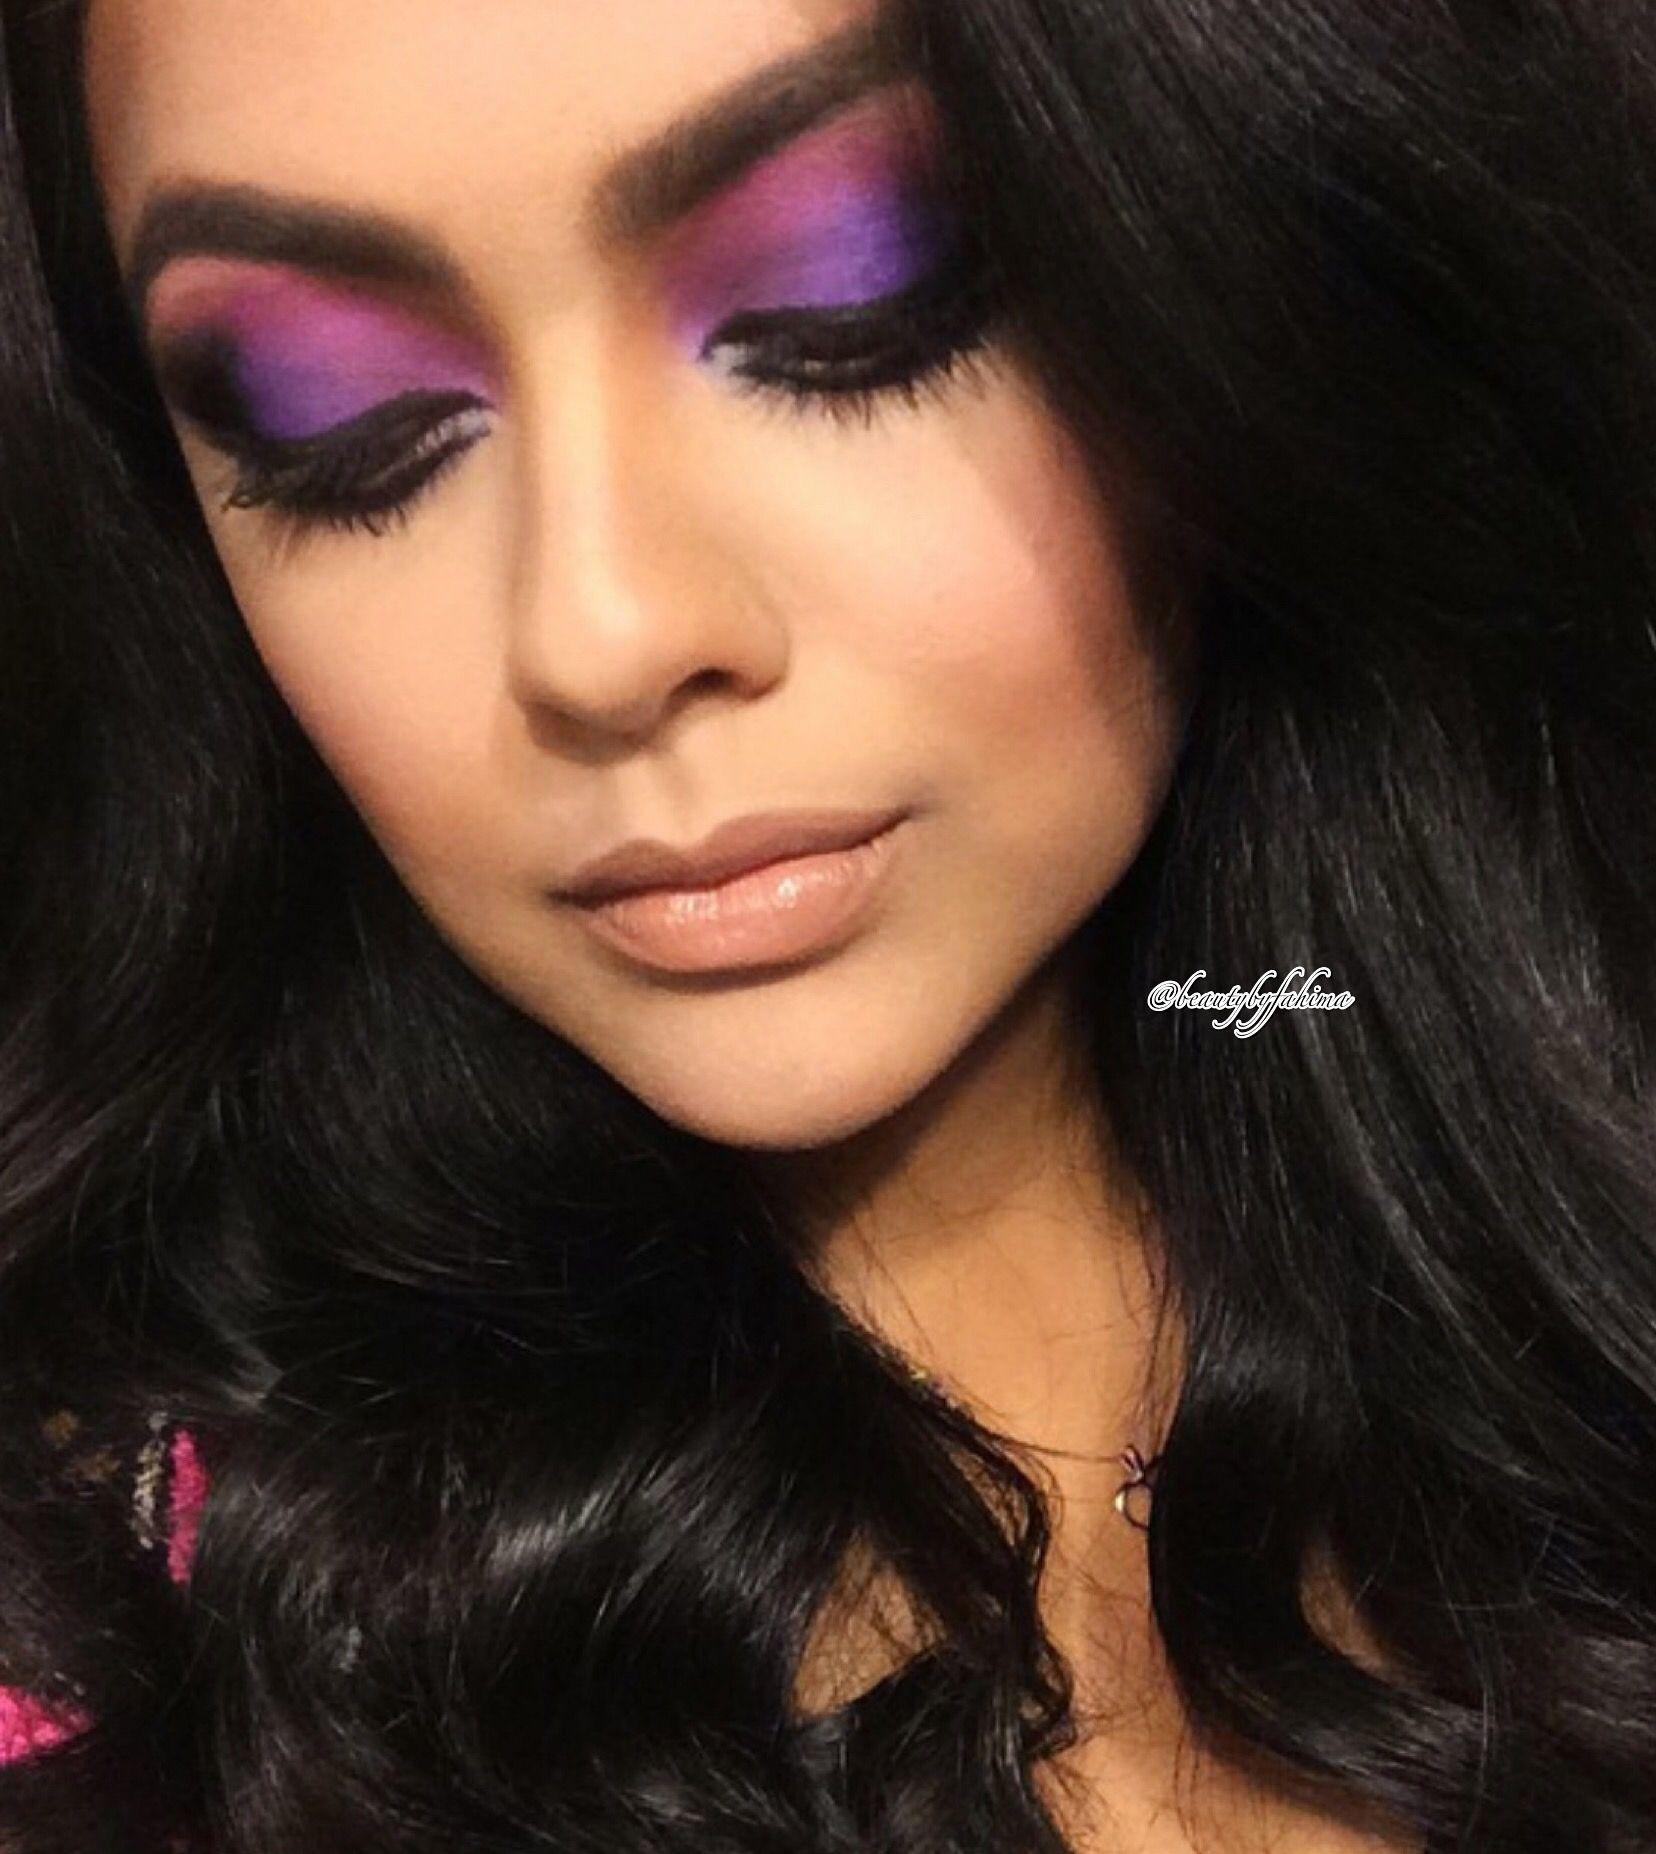 Came across an old pic love purple eye makeup looks mua